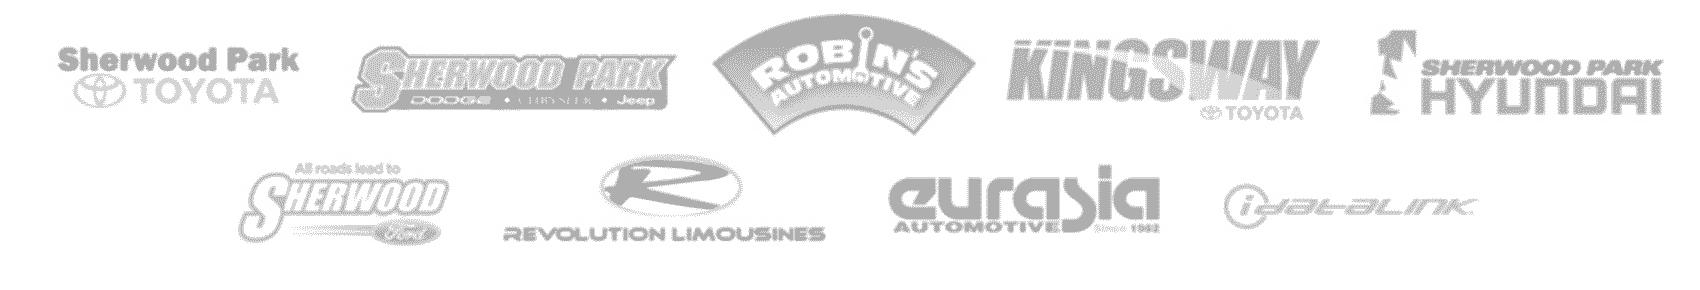 homepage_logos.png